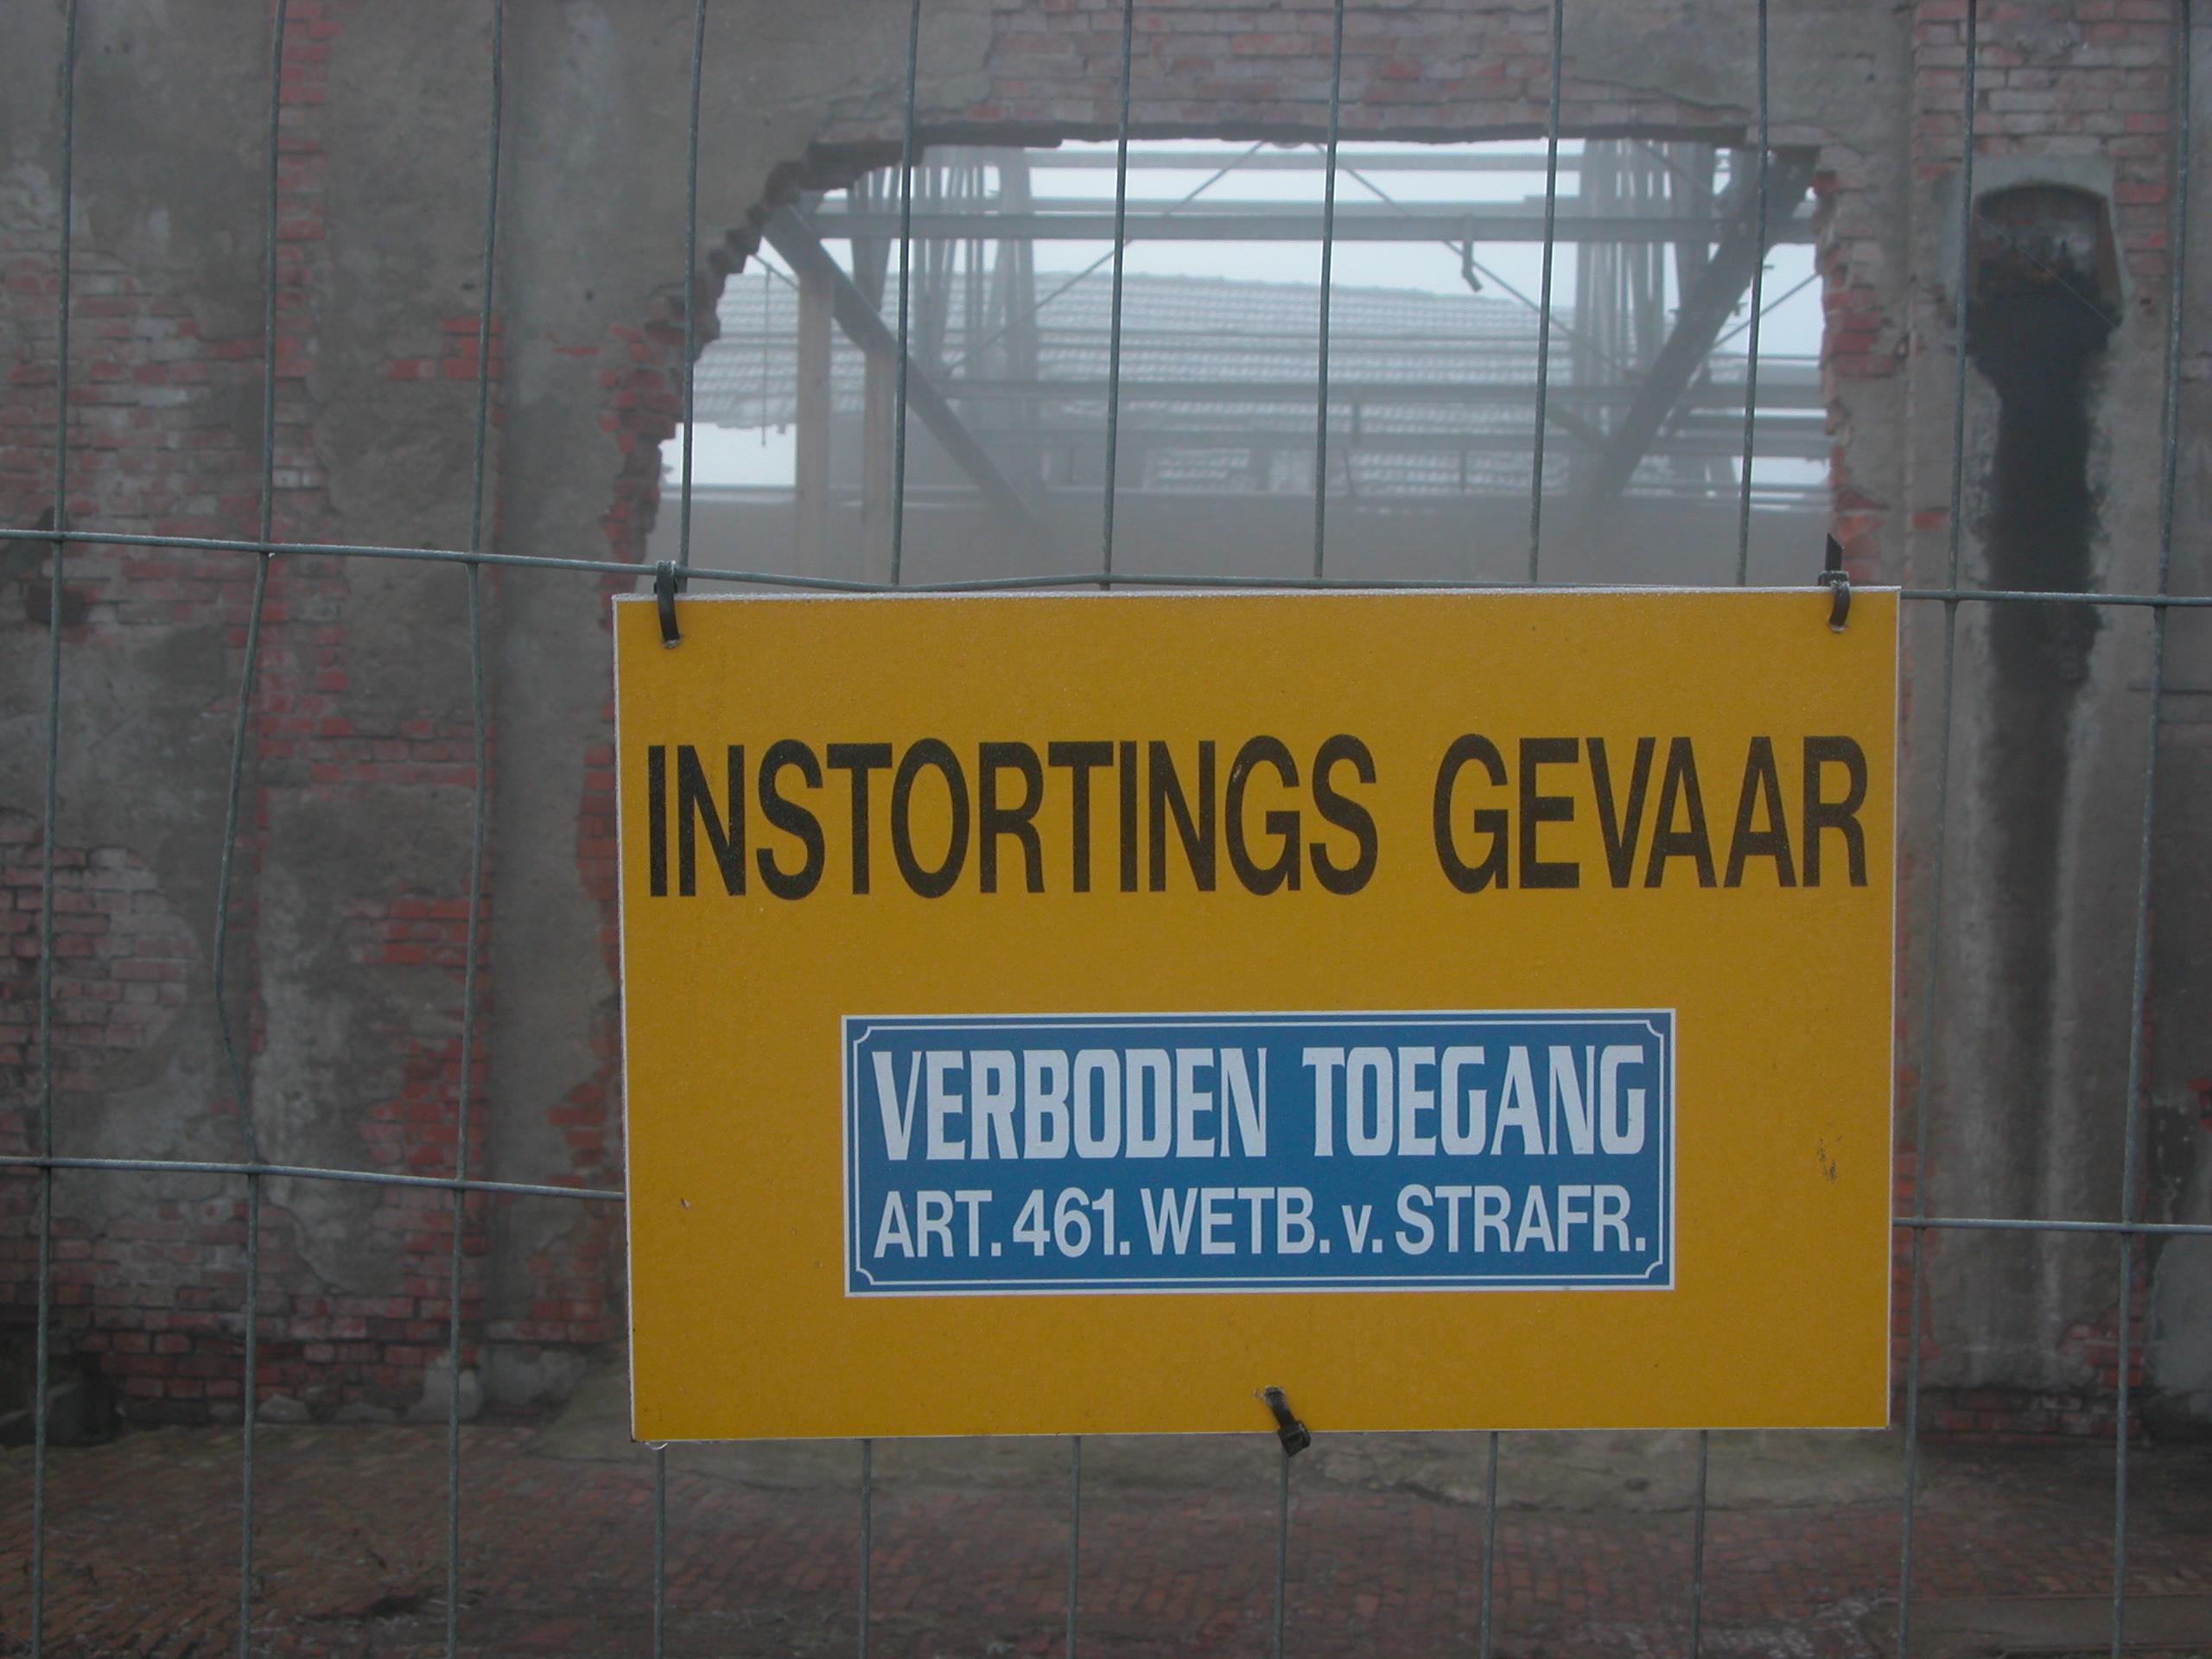 warning sign colaps warning do not trespass trespas enter